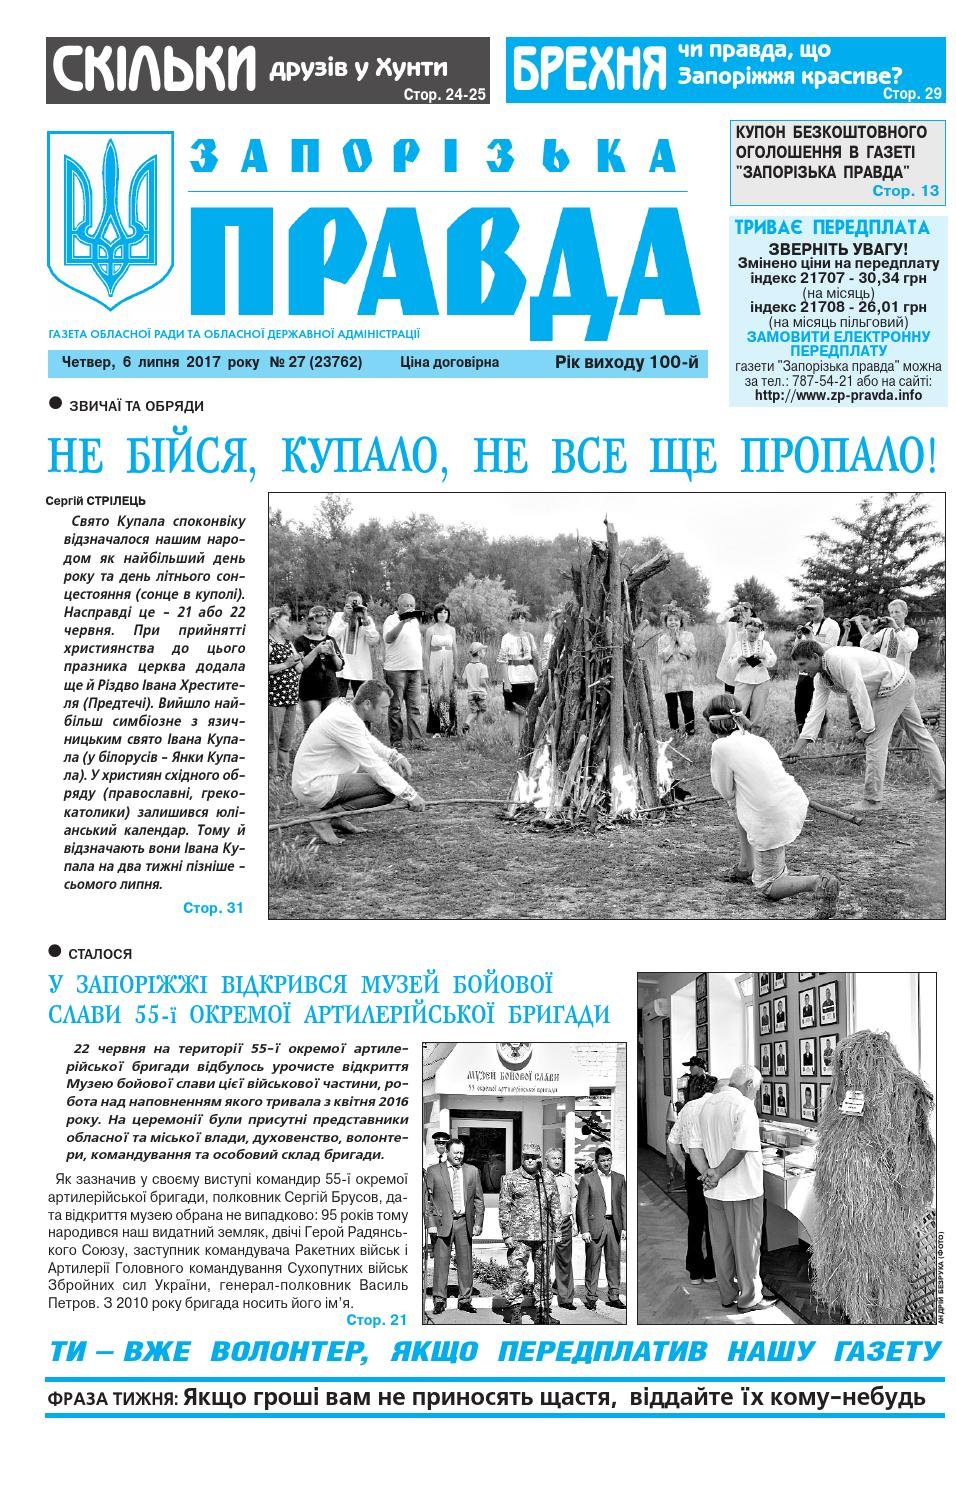 569b21840d17af 06 07 17 by Запорізька правда - issuu